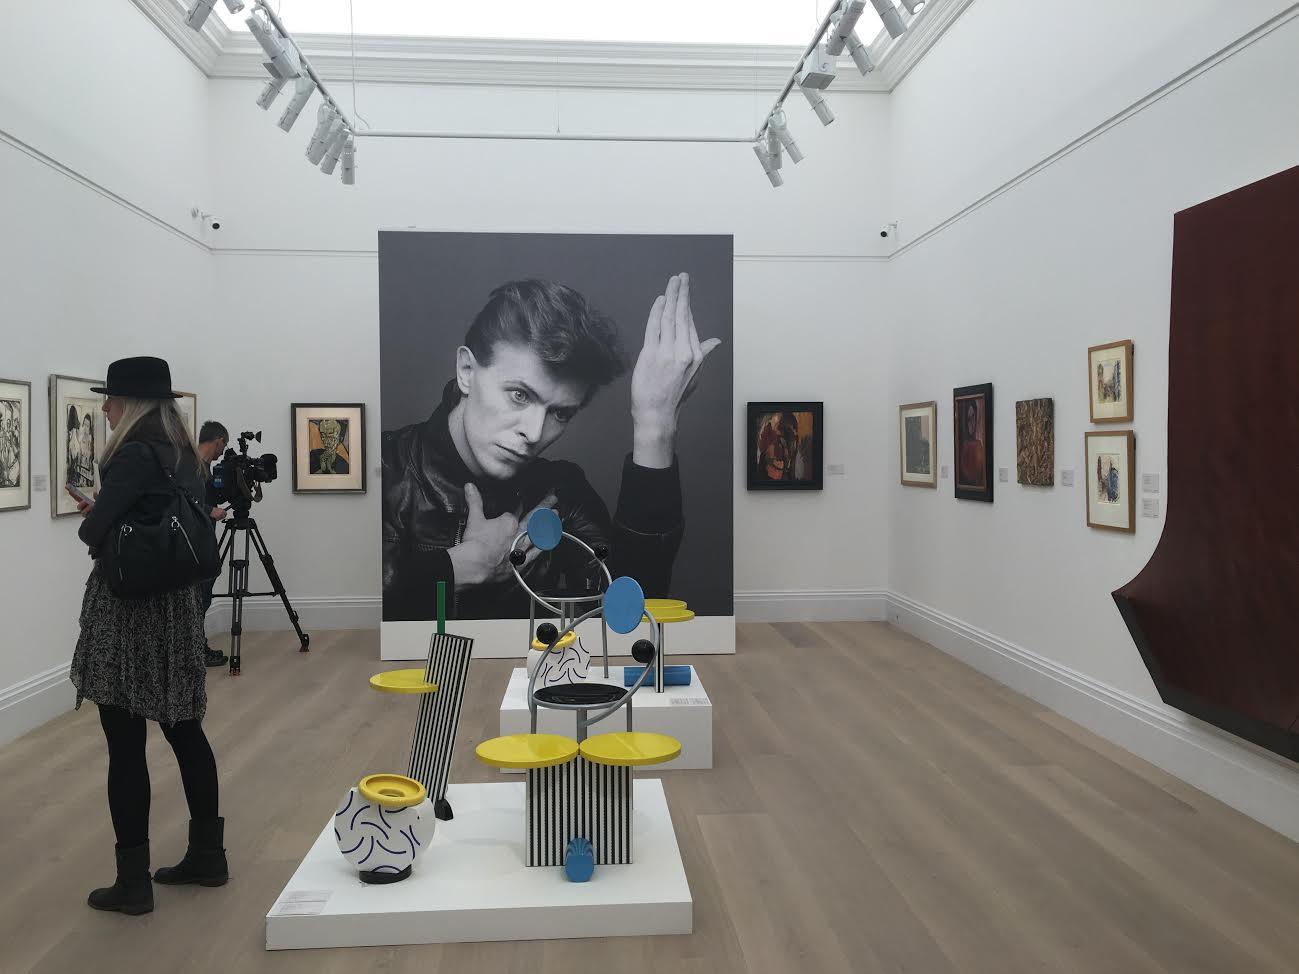 David Bowie art